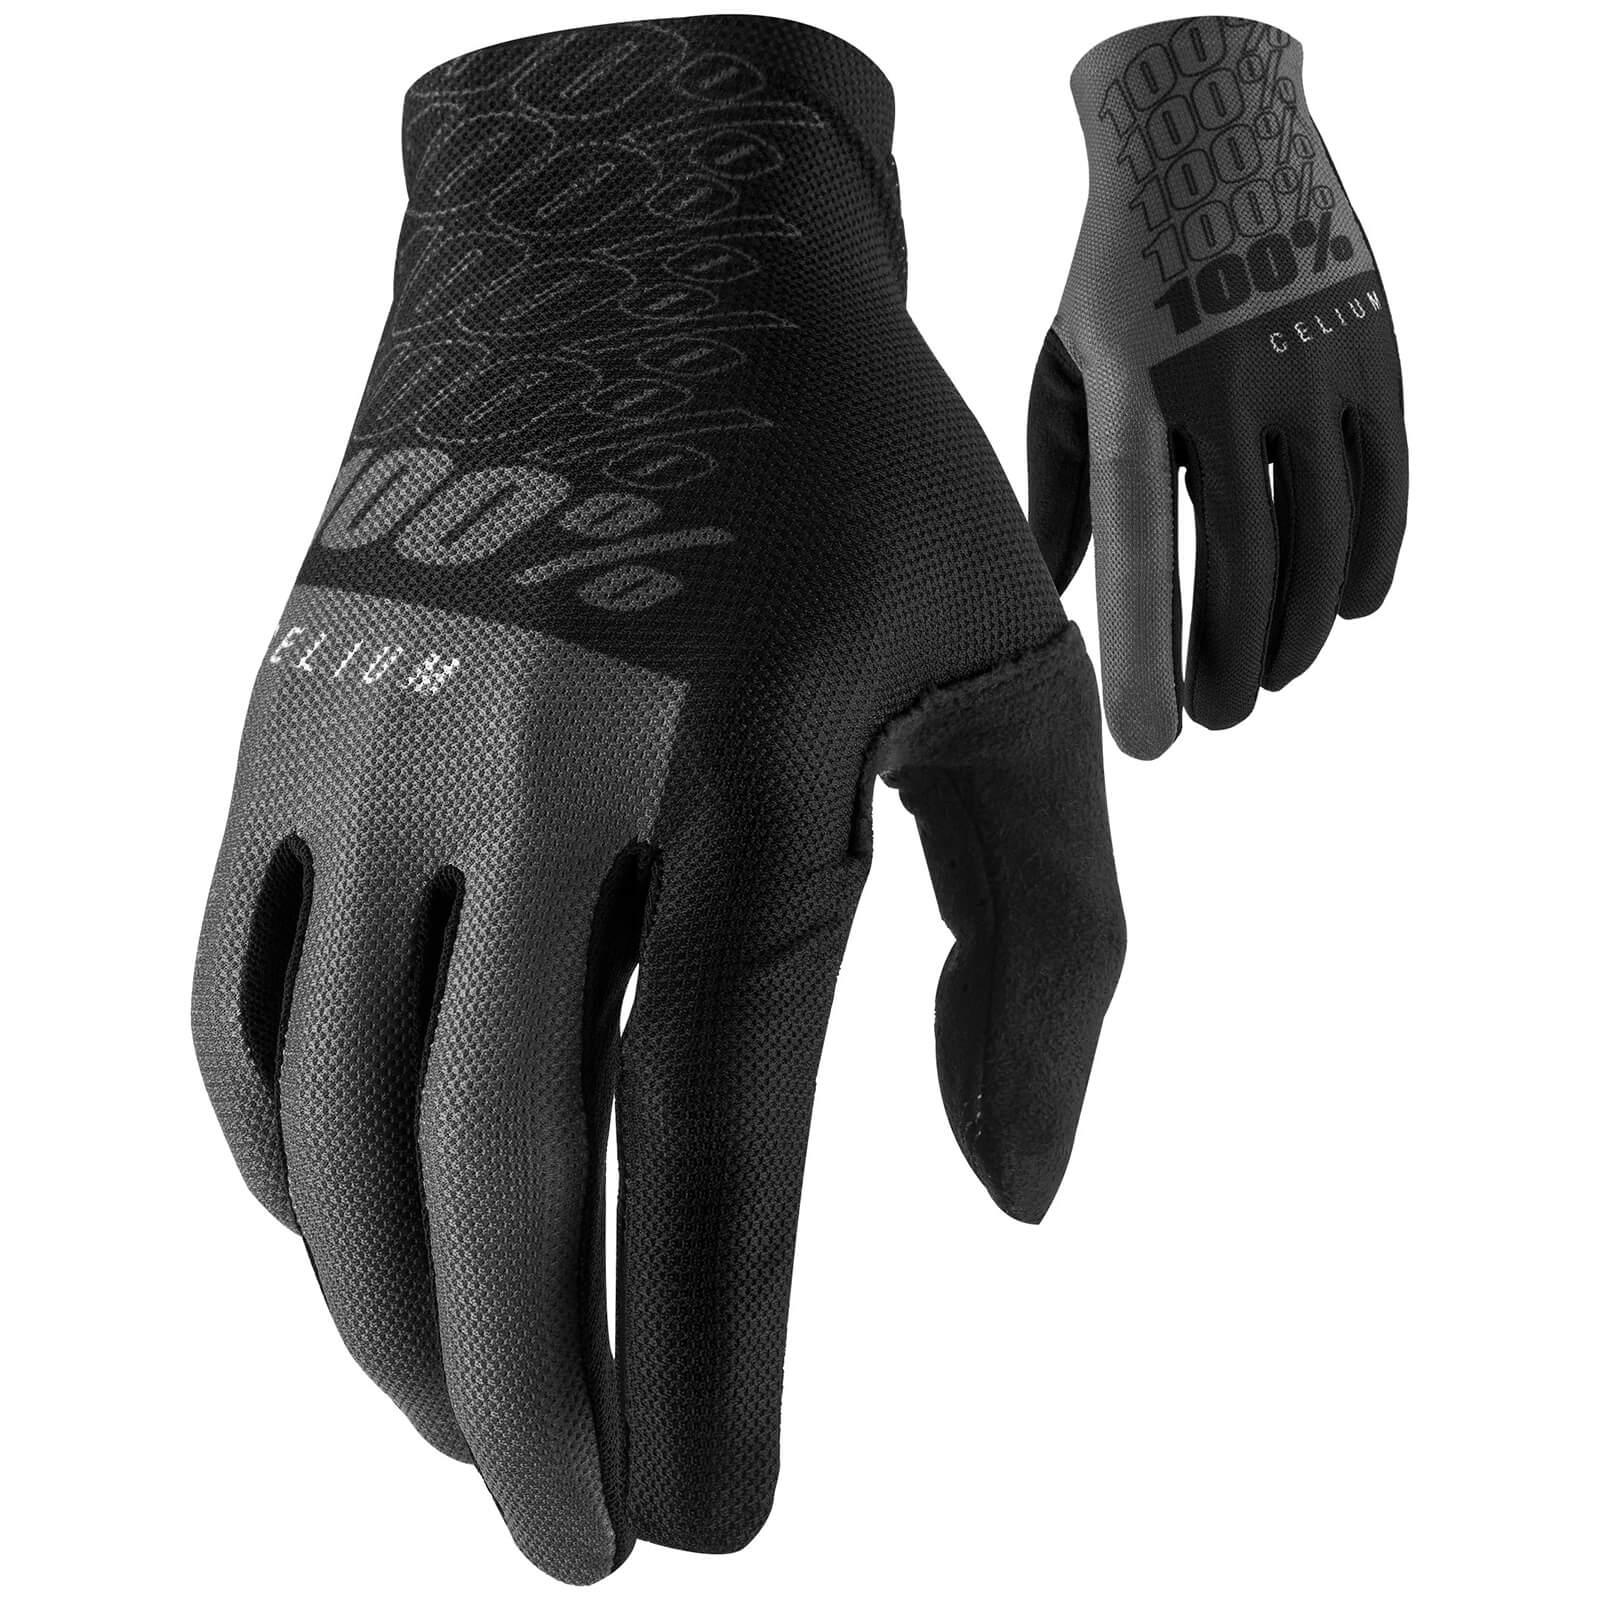 Image of 100% Celium MTB Gloves - XXL - Black/Grey